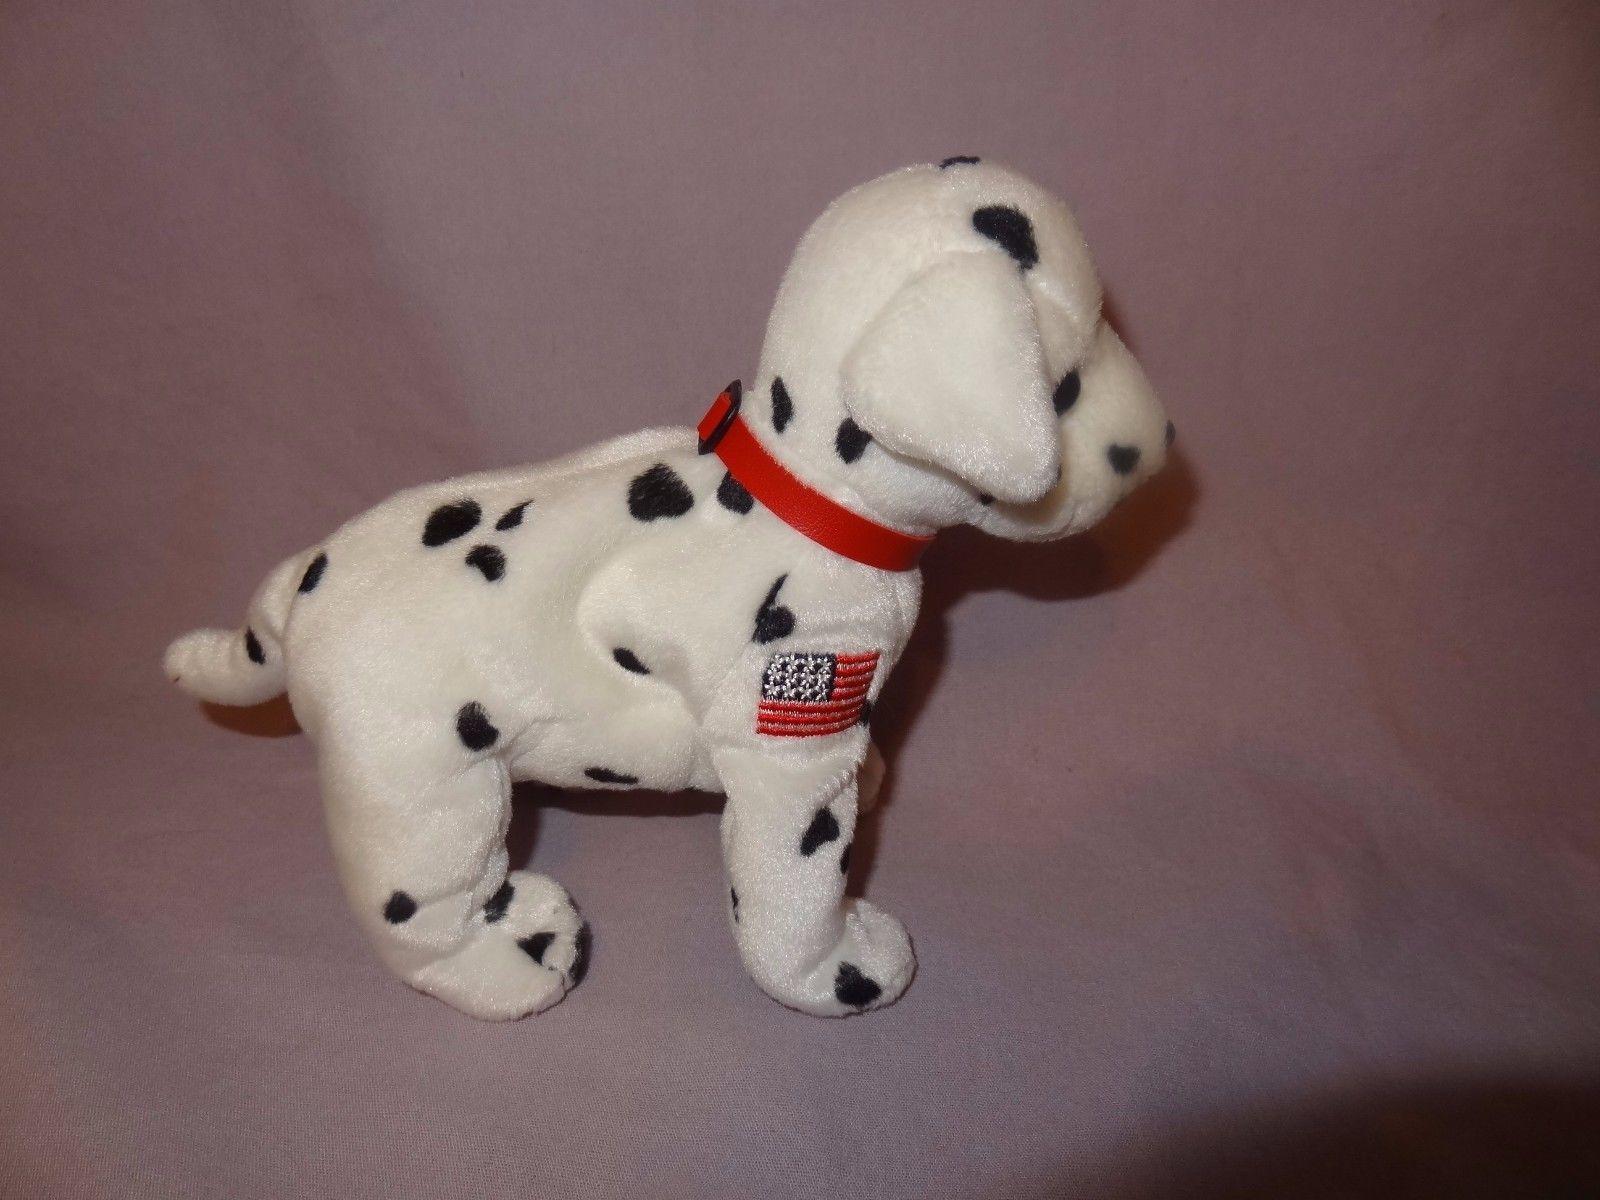 "Rescue Dalmatian Dog 2001 Ty Beanie Babies Plush Stuffed Animal 7"" long USA Flag"